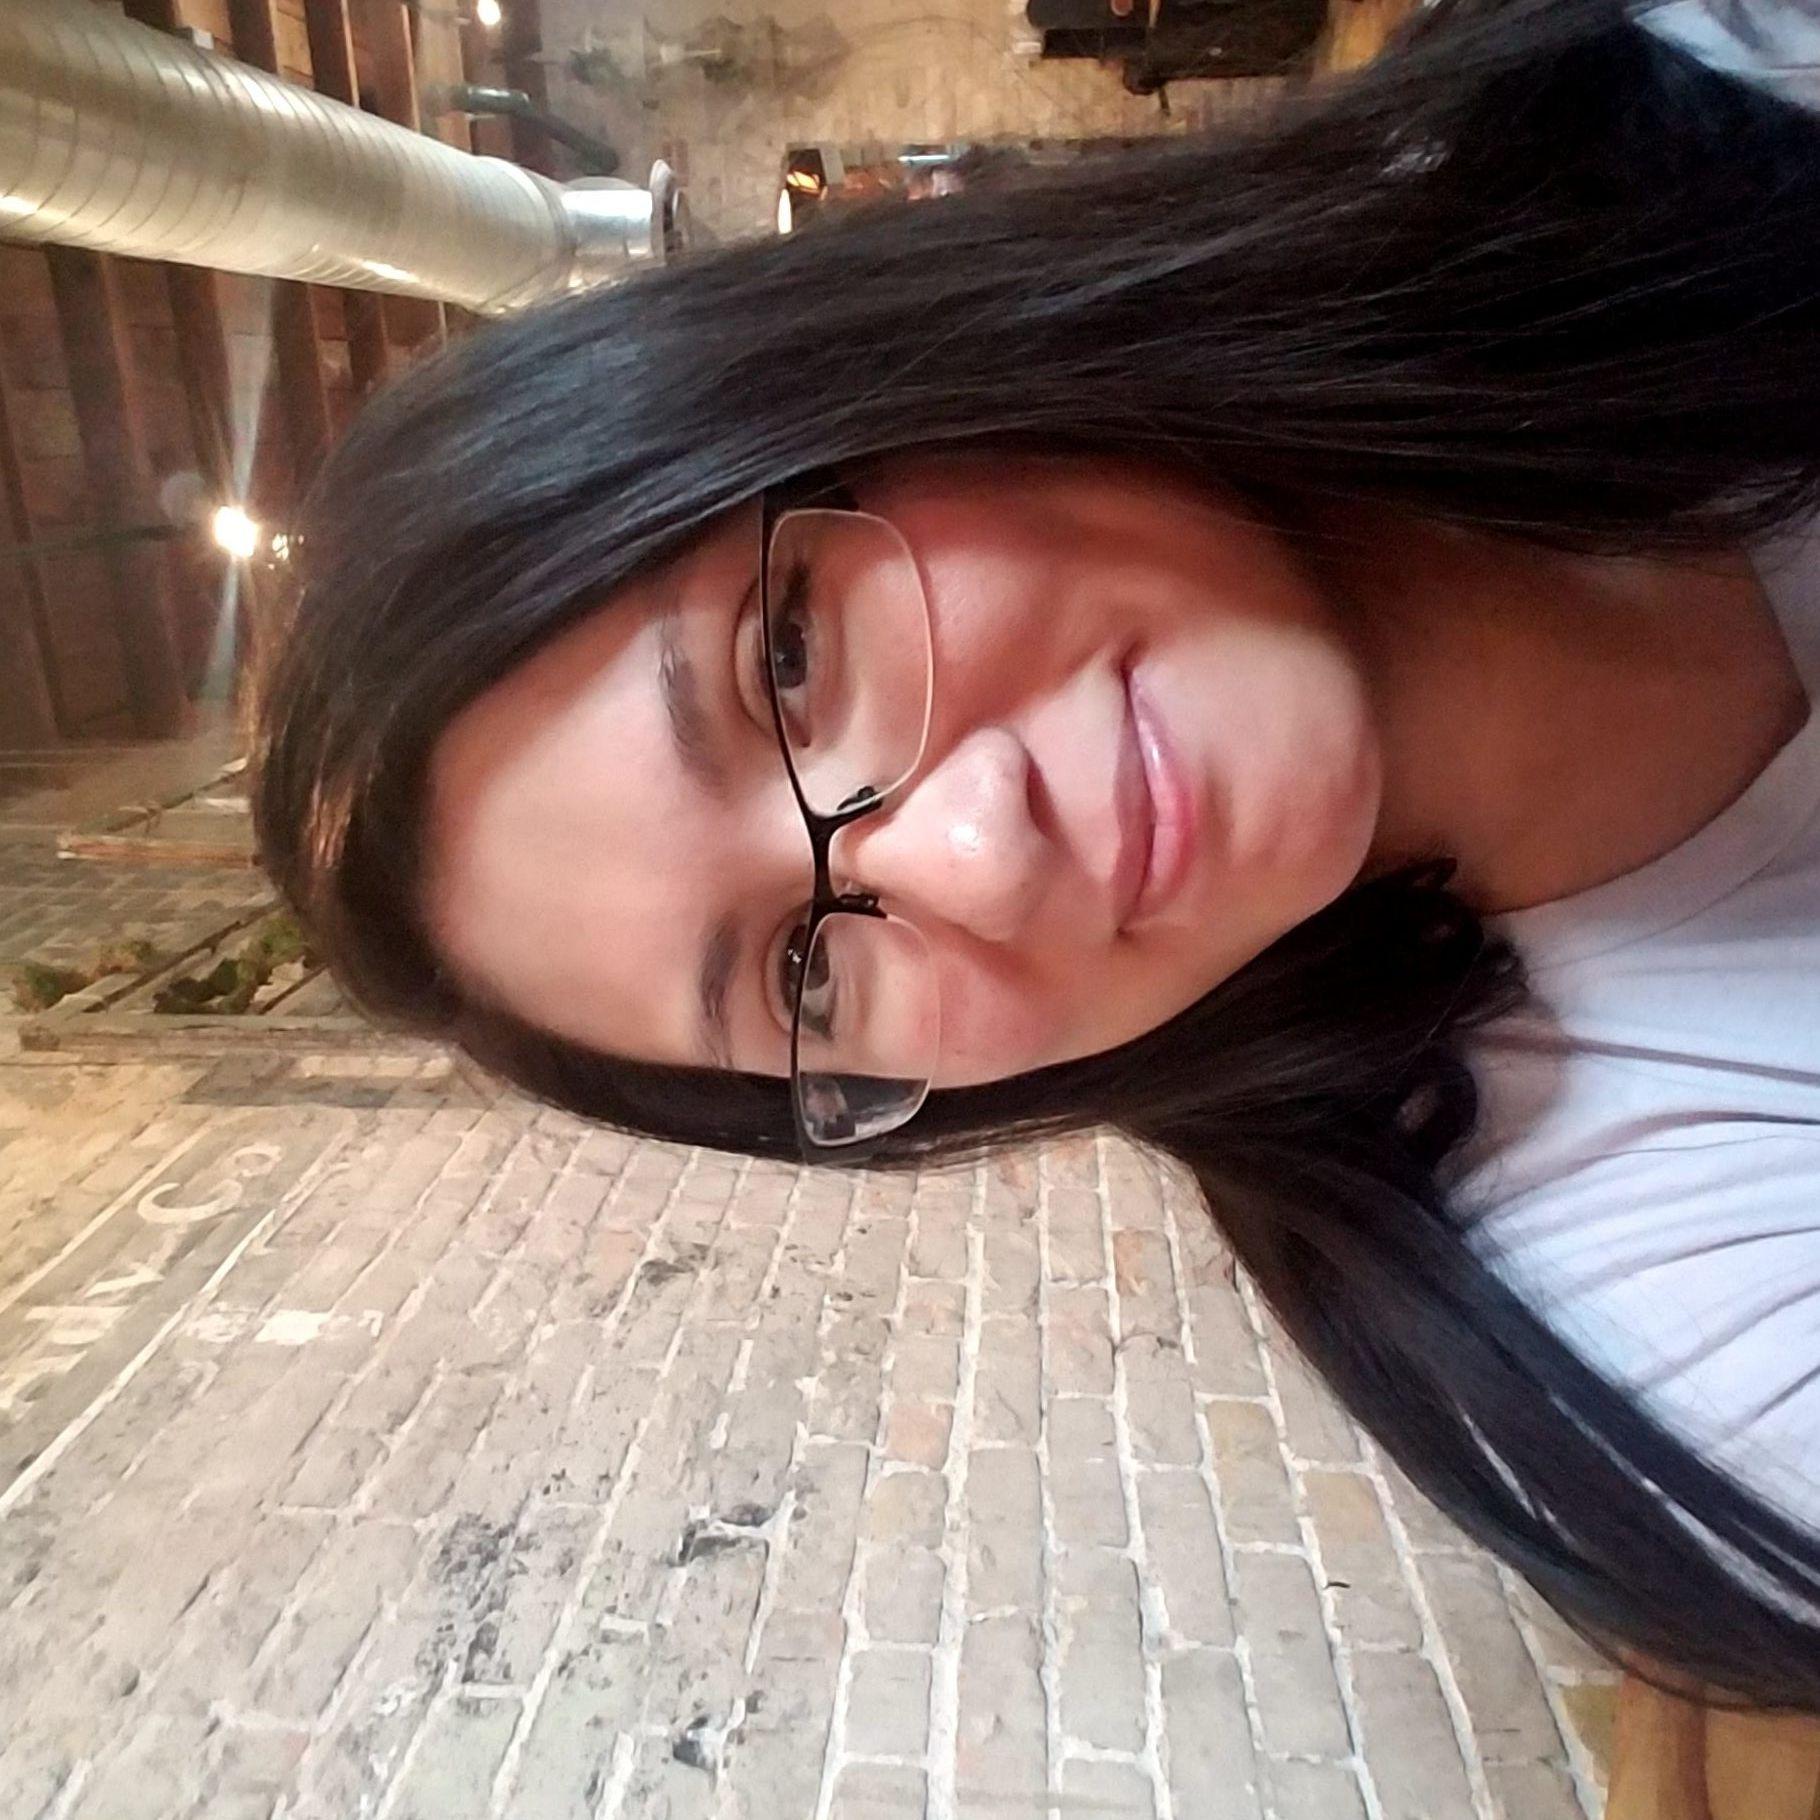 Natasha Stamey came to Texas Childrenu0027s fresh